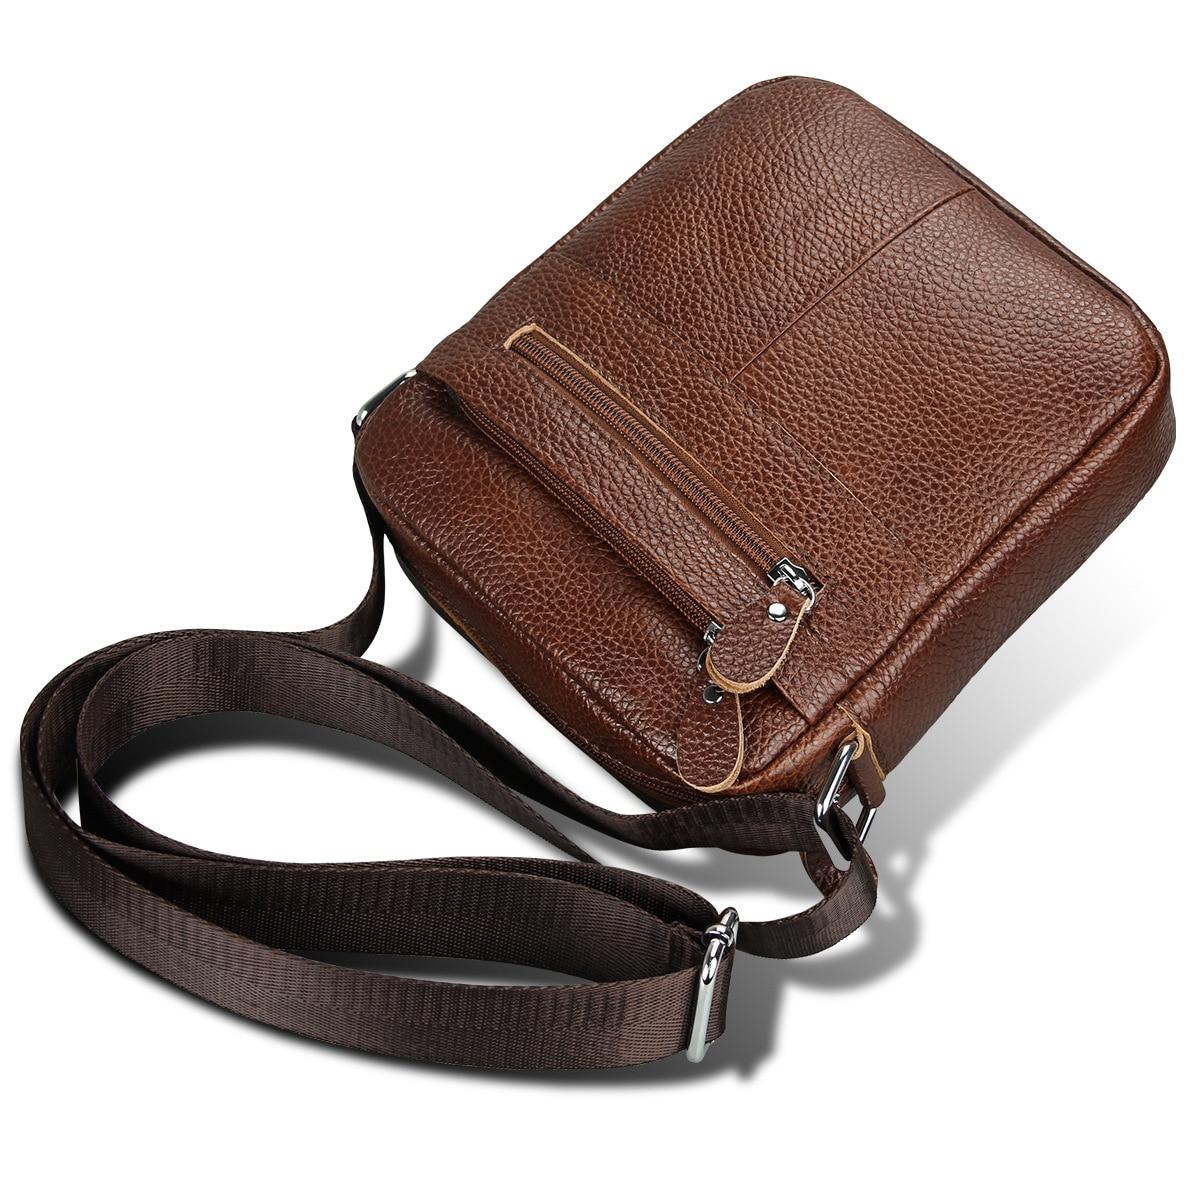 2018 New Luxury Brand Men Handbags Genuine Leather Male Shoulder Bag Fashion Crossbody Bag Boy Casual Messenger Bags 22*19*6cm